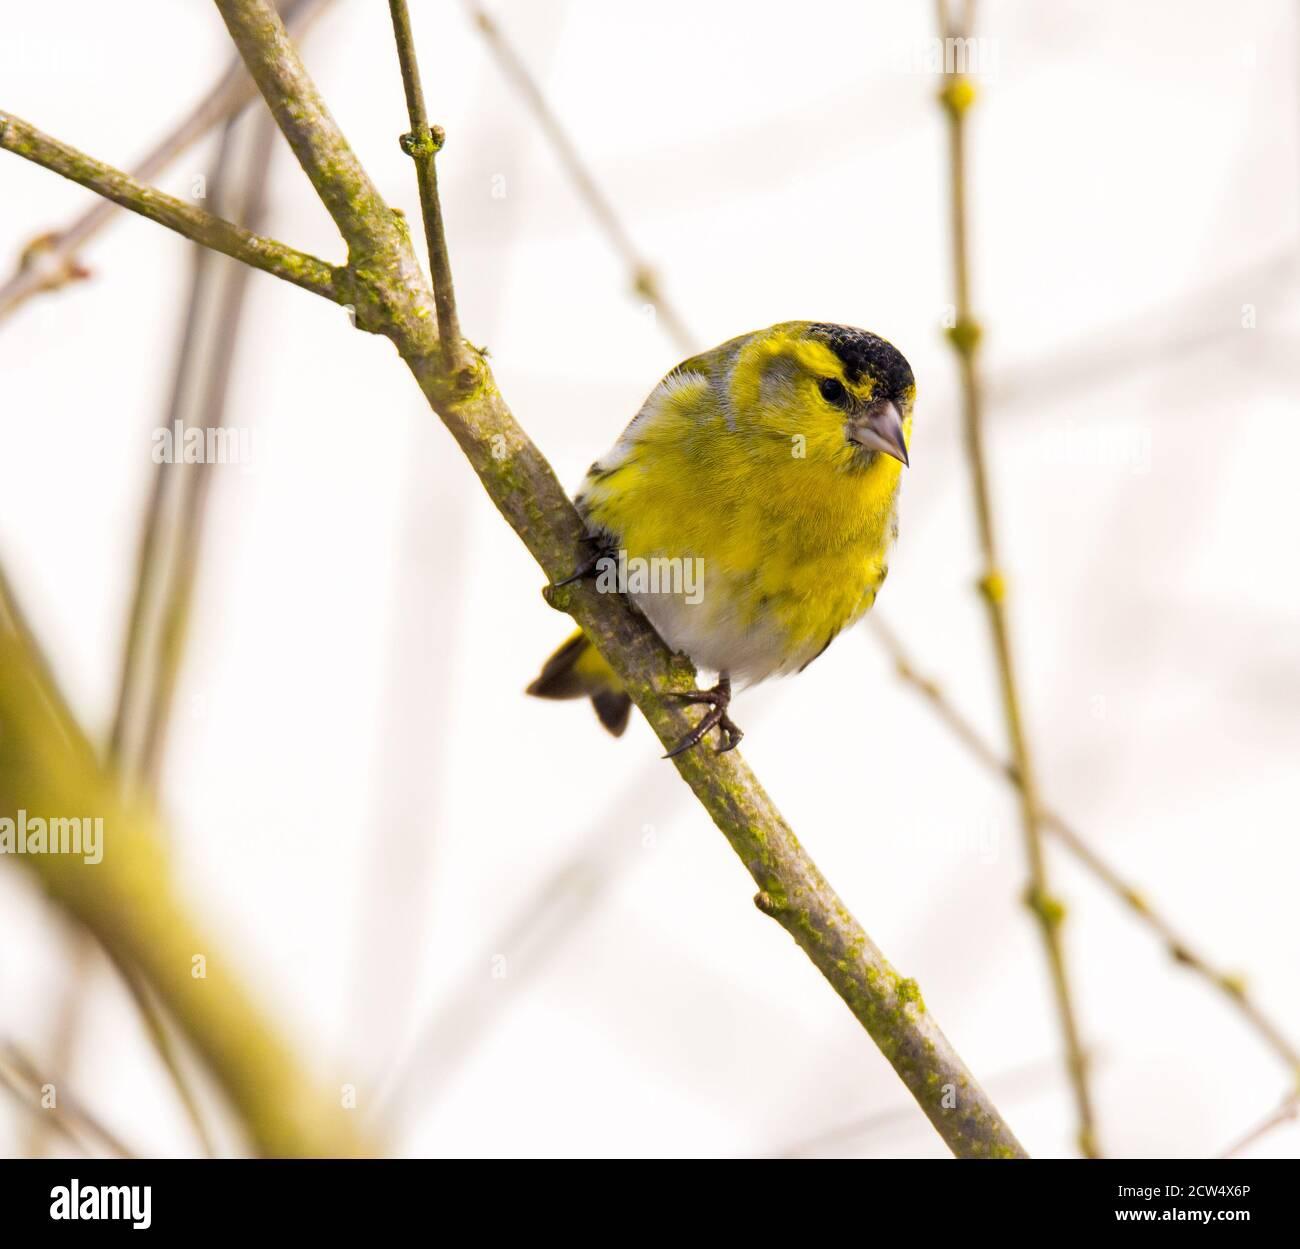 Closeup of a male siskin bird sitting on the brach of a tree Stock Photo